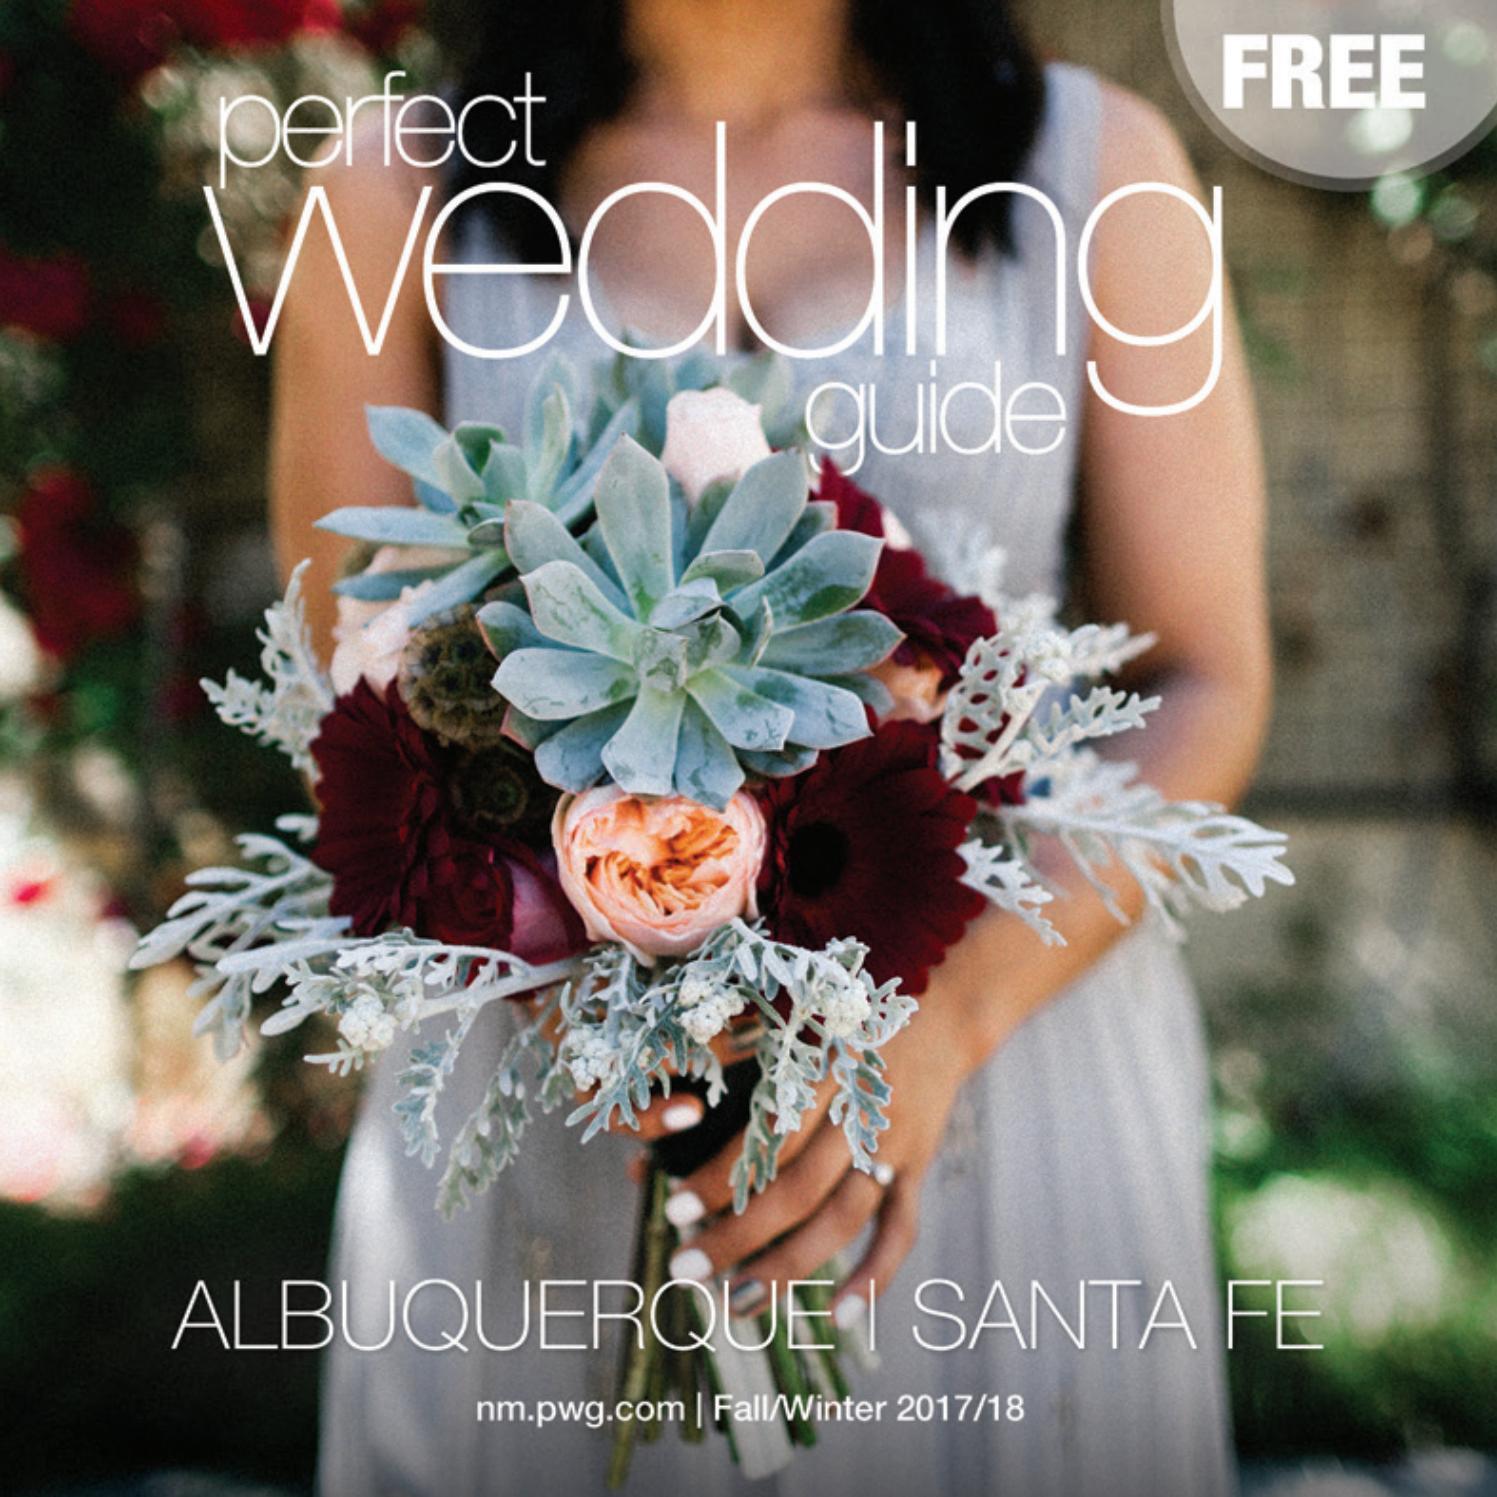 Wedding Invitations Albuquerque: Perfect Wedding Guide Albuquerque/Santa Fe Fall/Winter